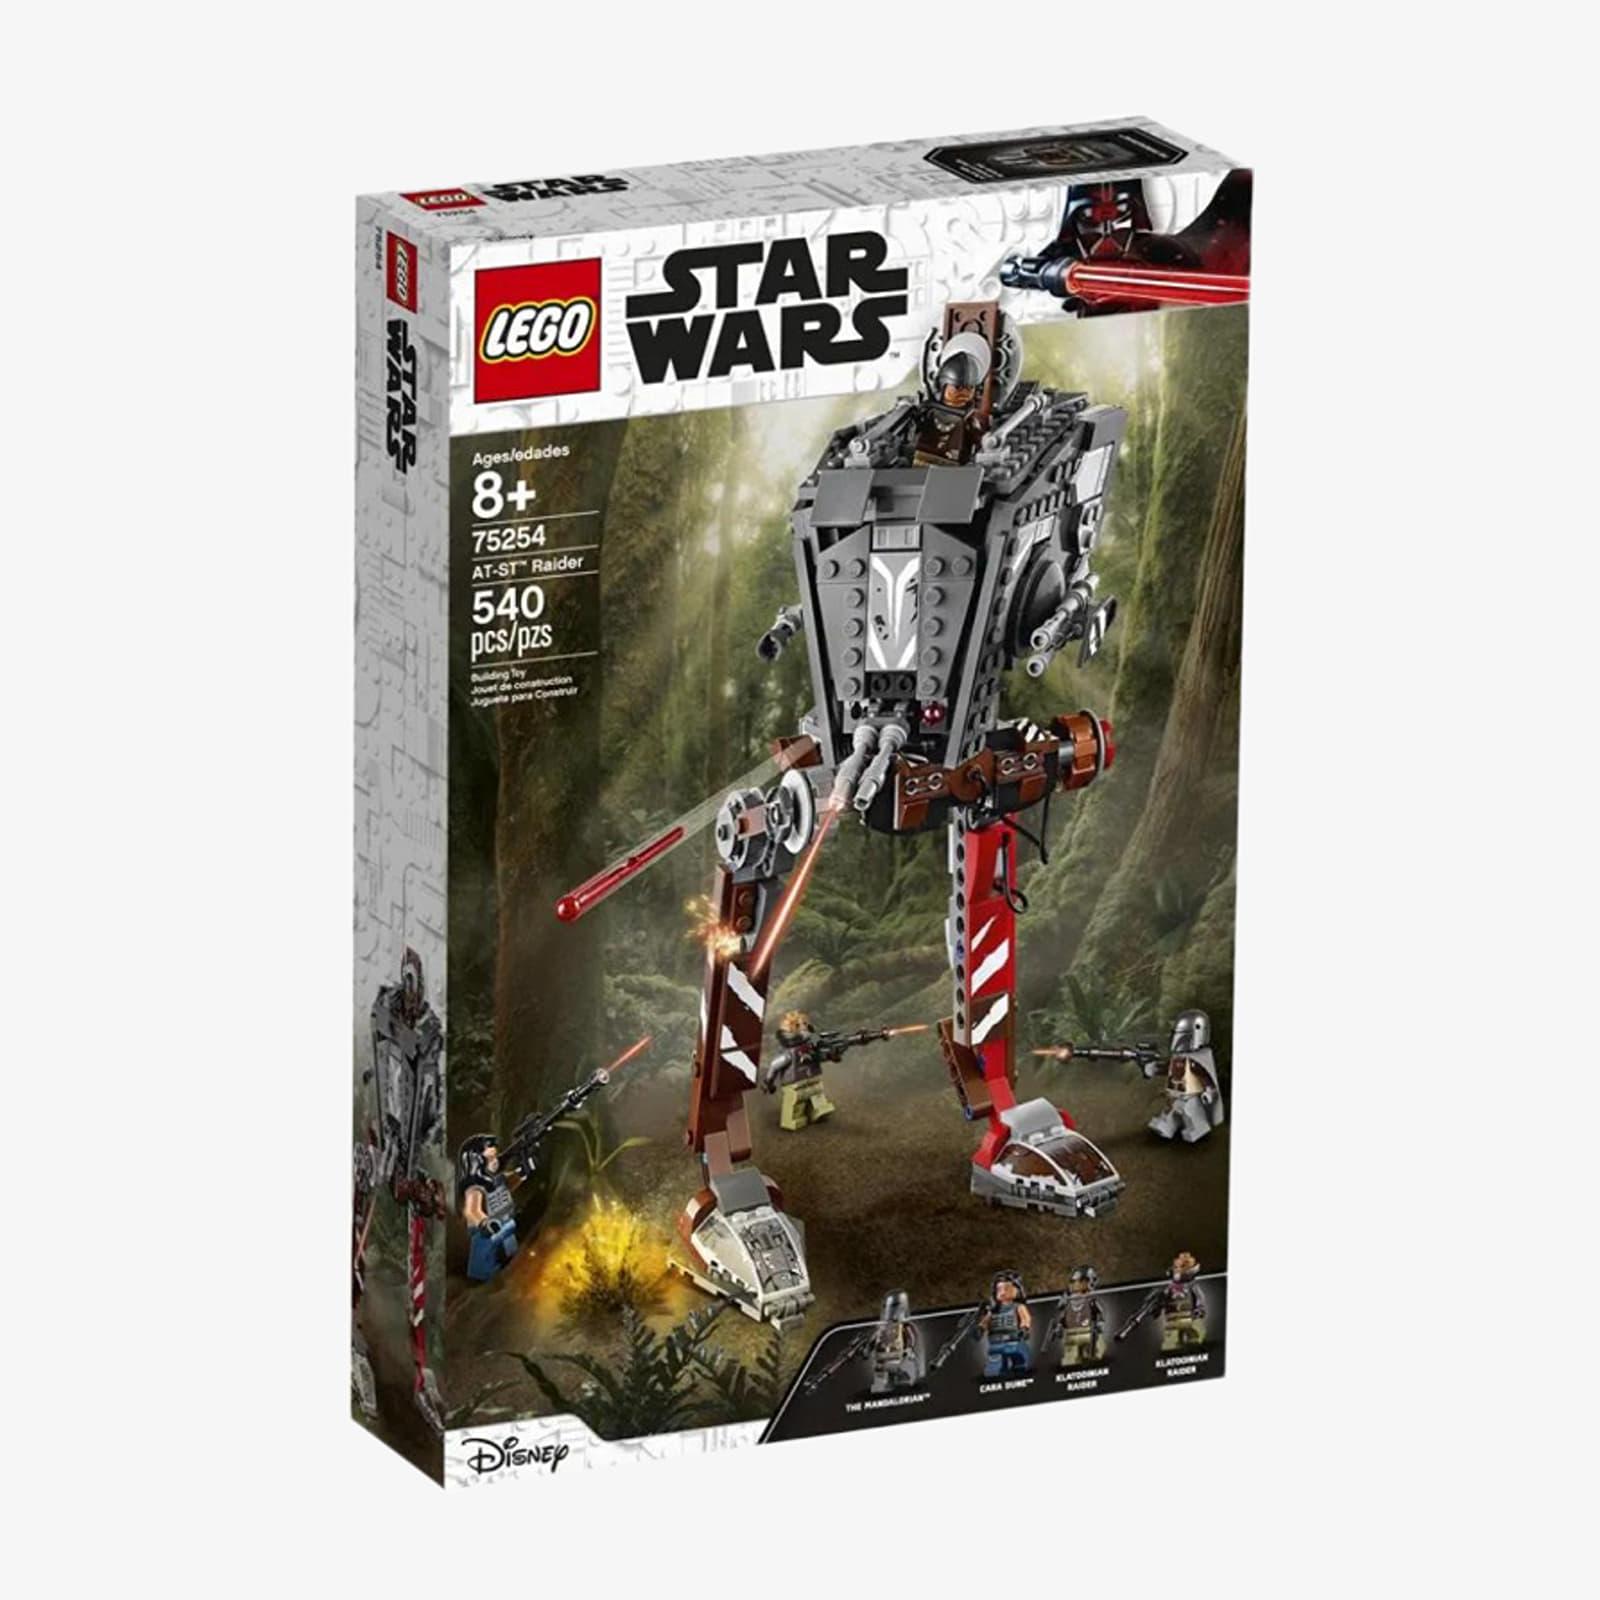 Kits de LEGO LEGO Star Wars AT-ST Raider